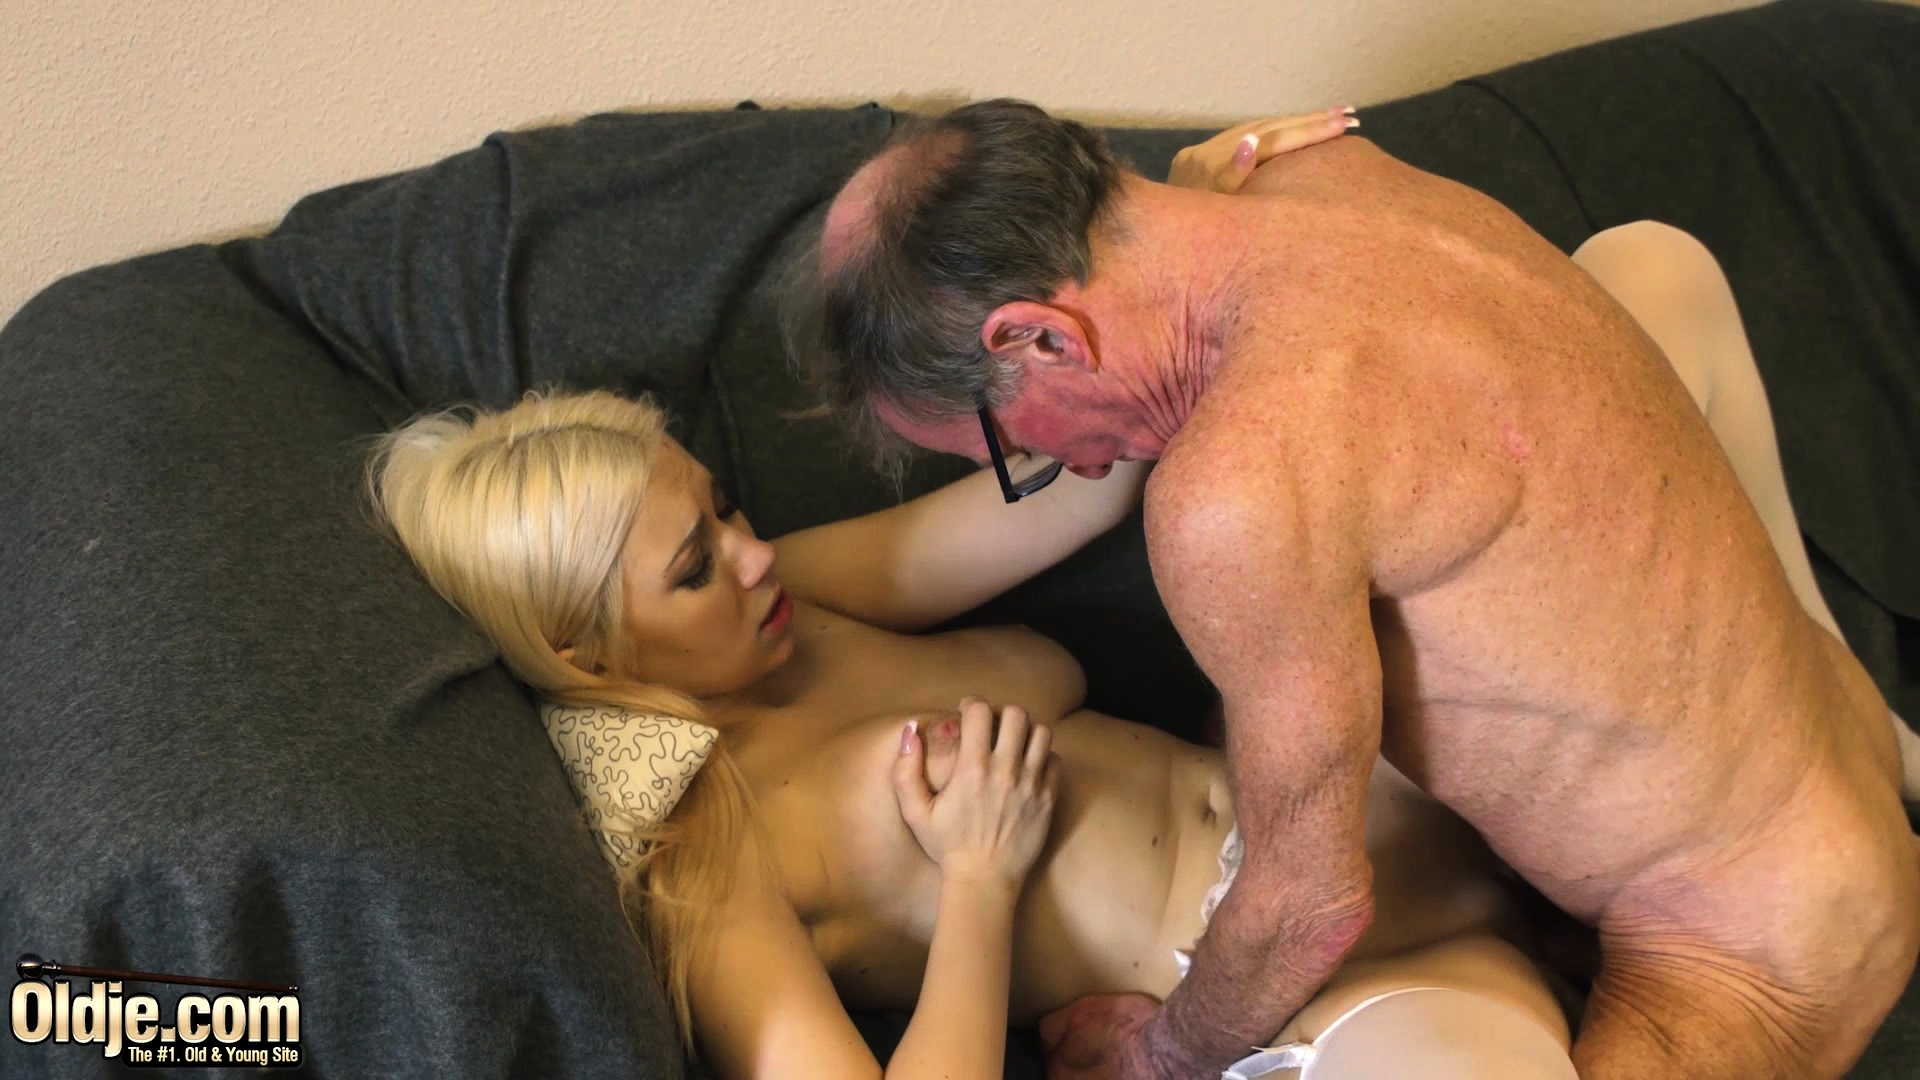 70 Porn free mobile porn - 70 year old man fucks 18yearold girl she